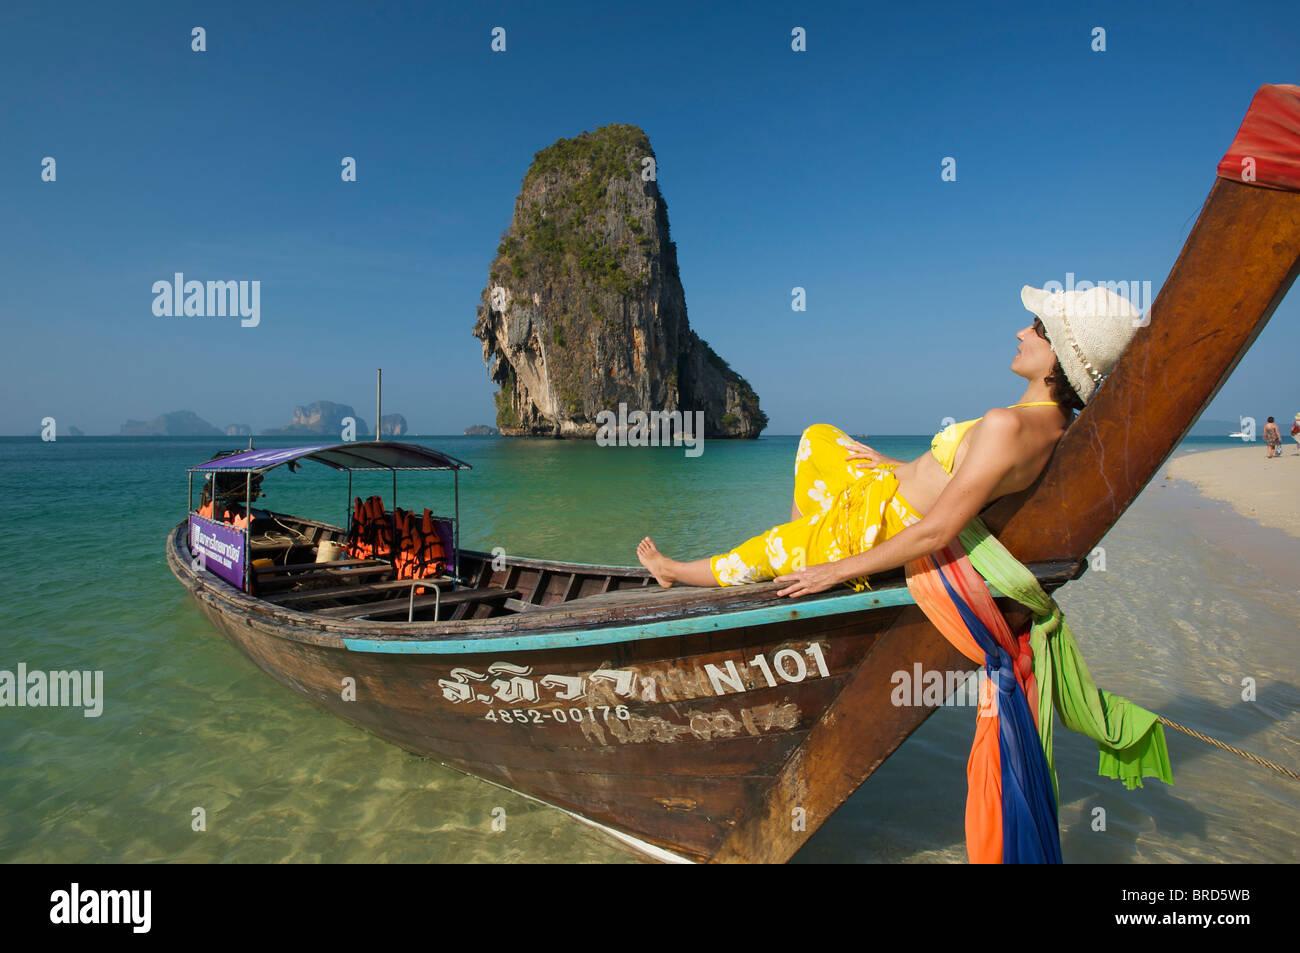 Frau, entspannend auf einem Longtail-Boot am Laem Phra Nang Beach, Krabi, Thailand Stockbild